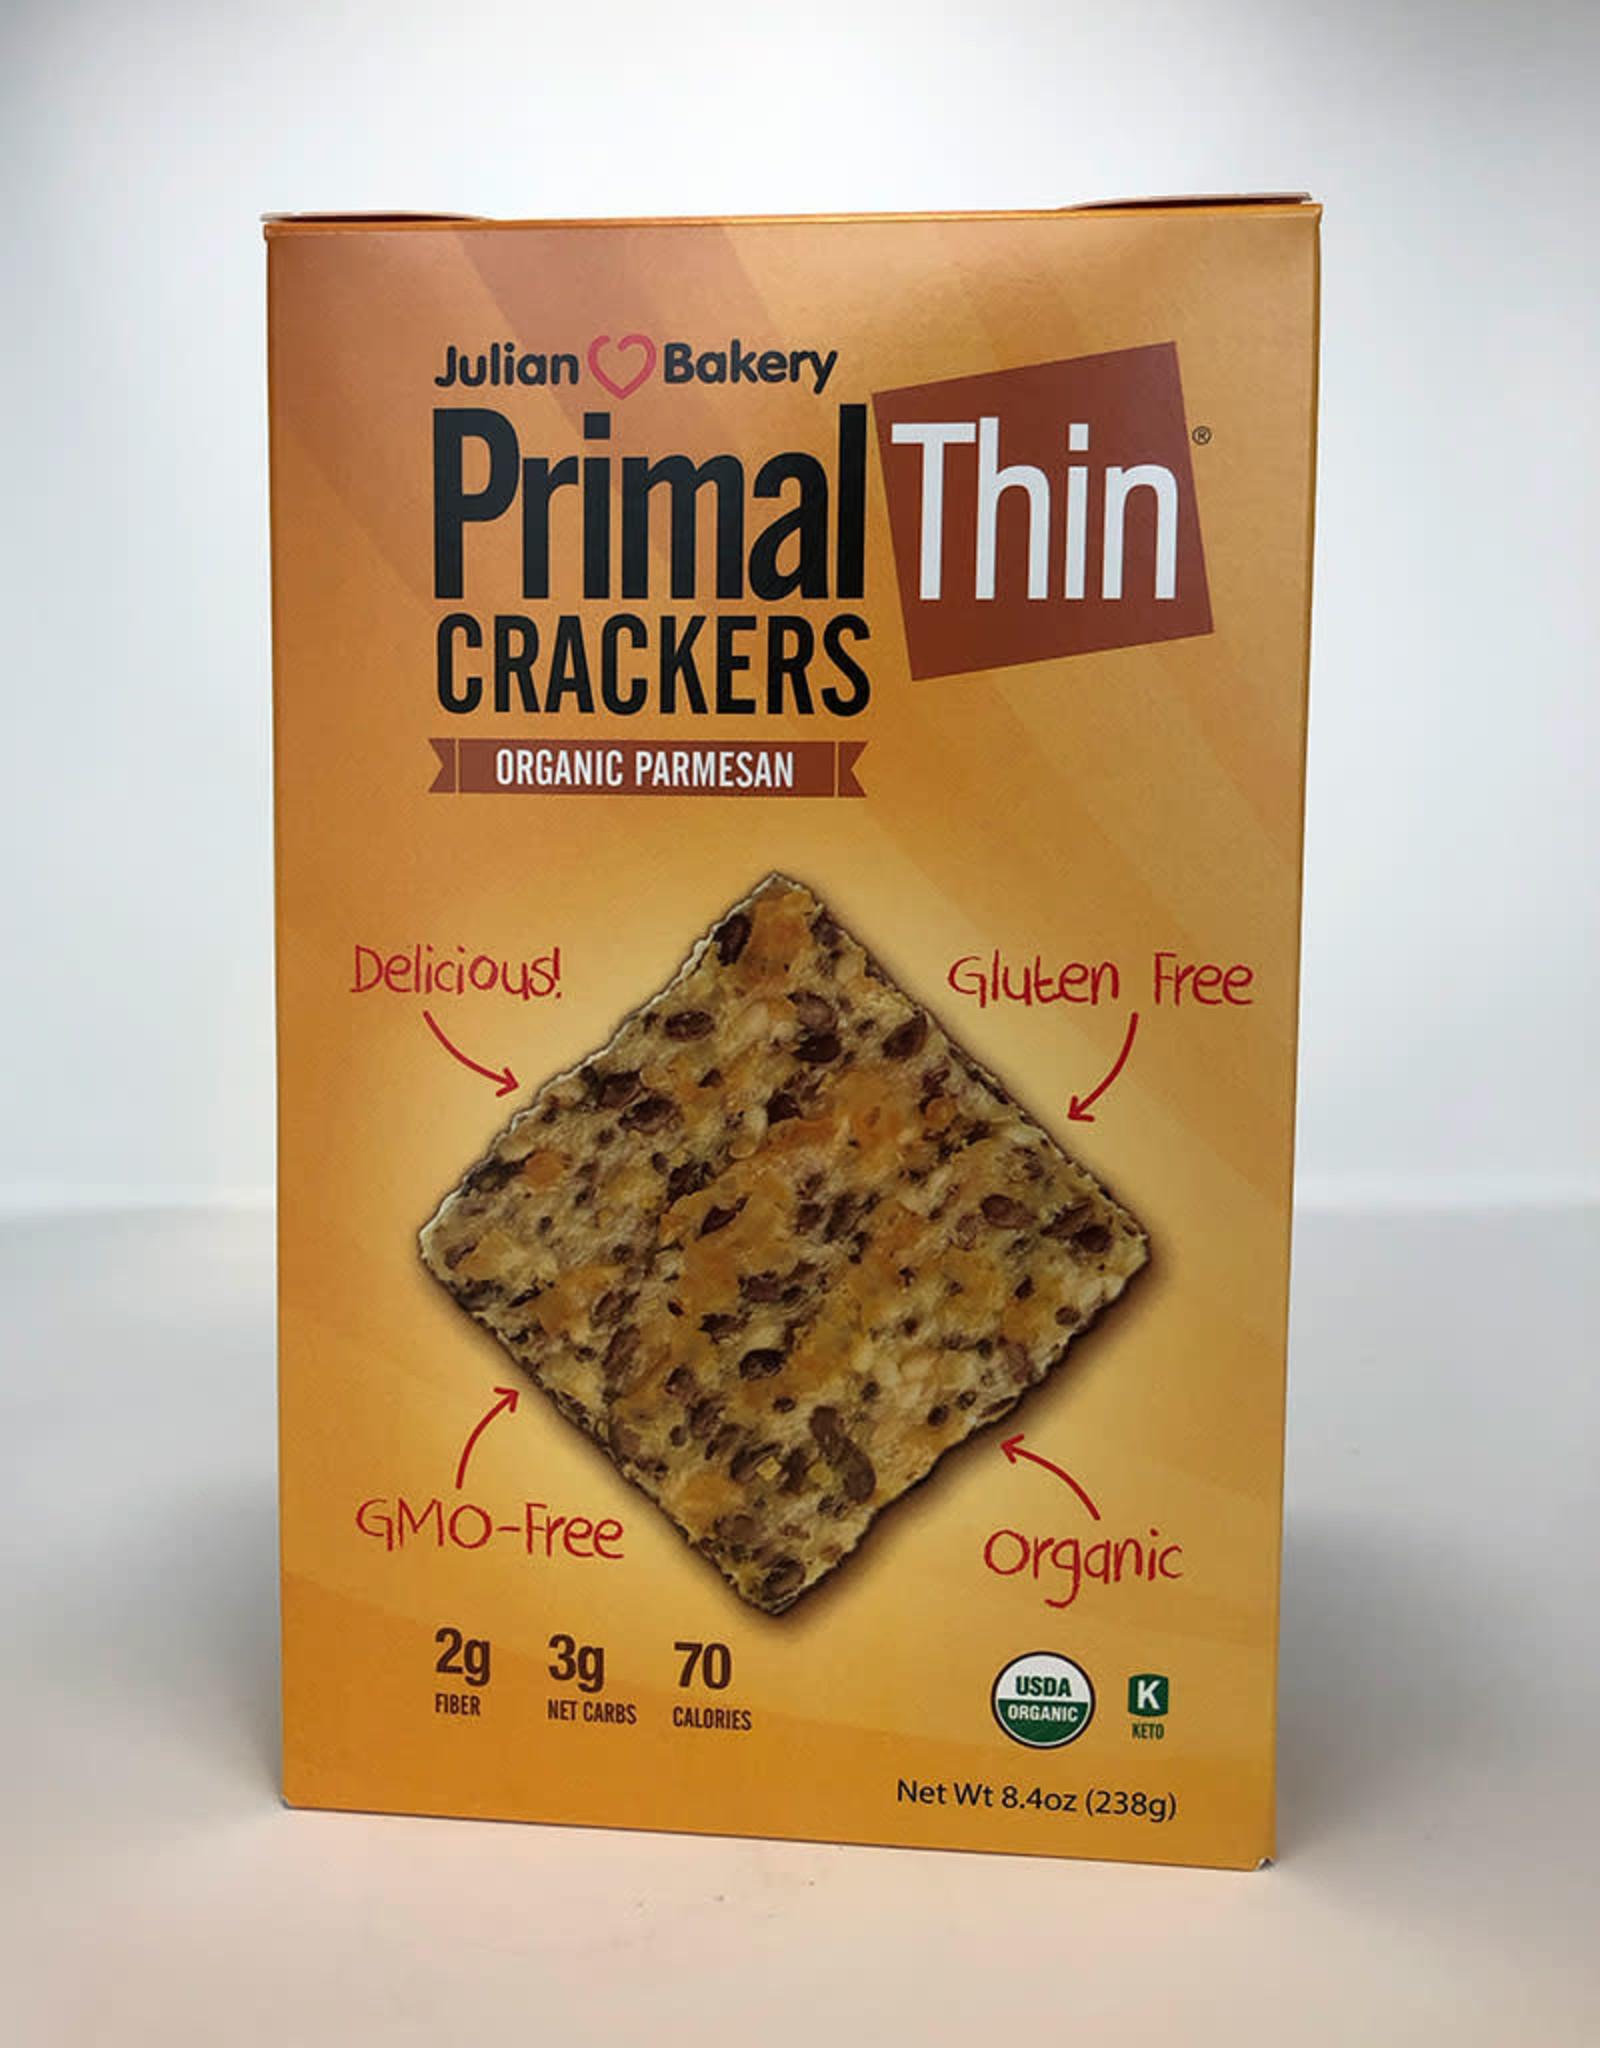 Julian Bakery Julian Bakery - Primal Thin Crackers, Organic Parmesan